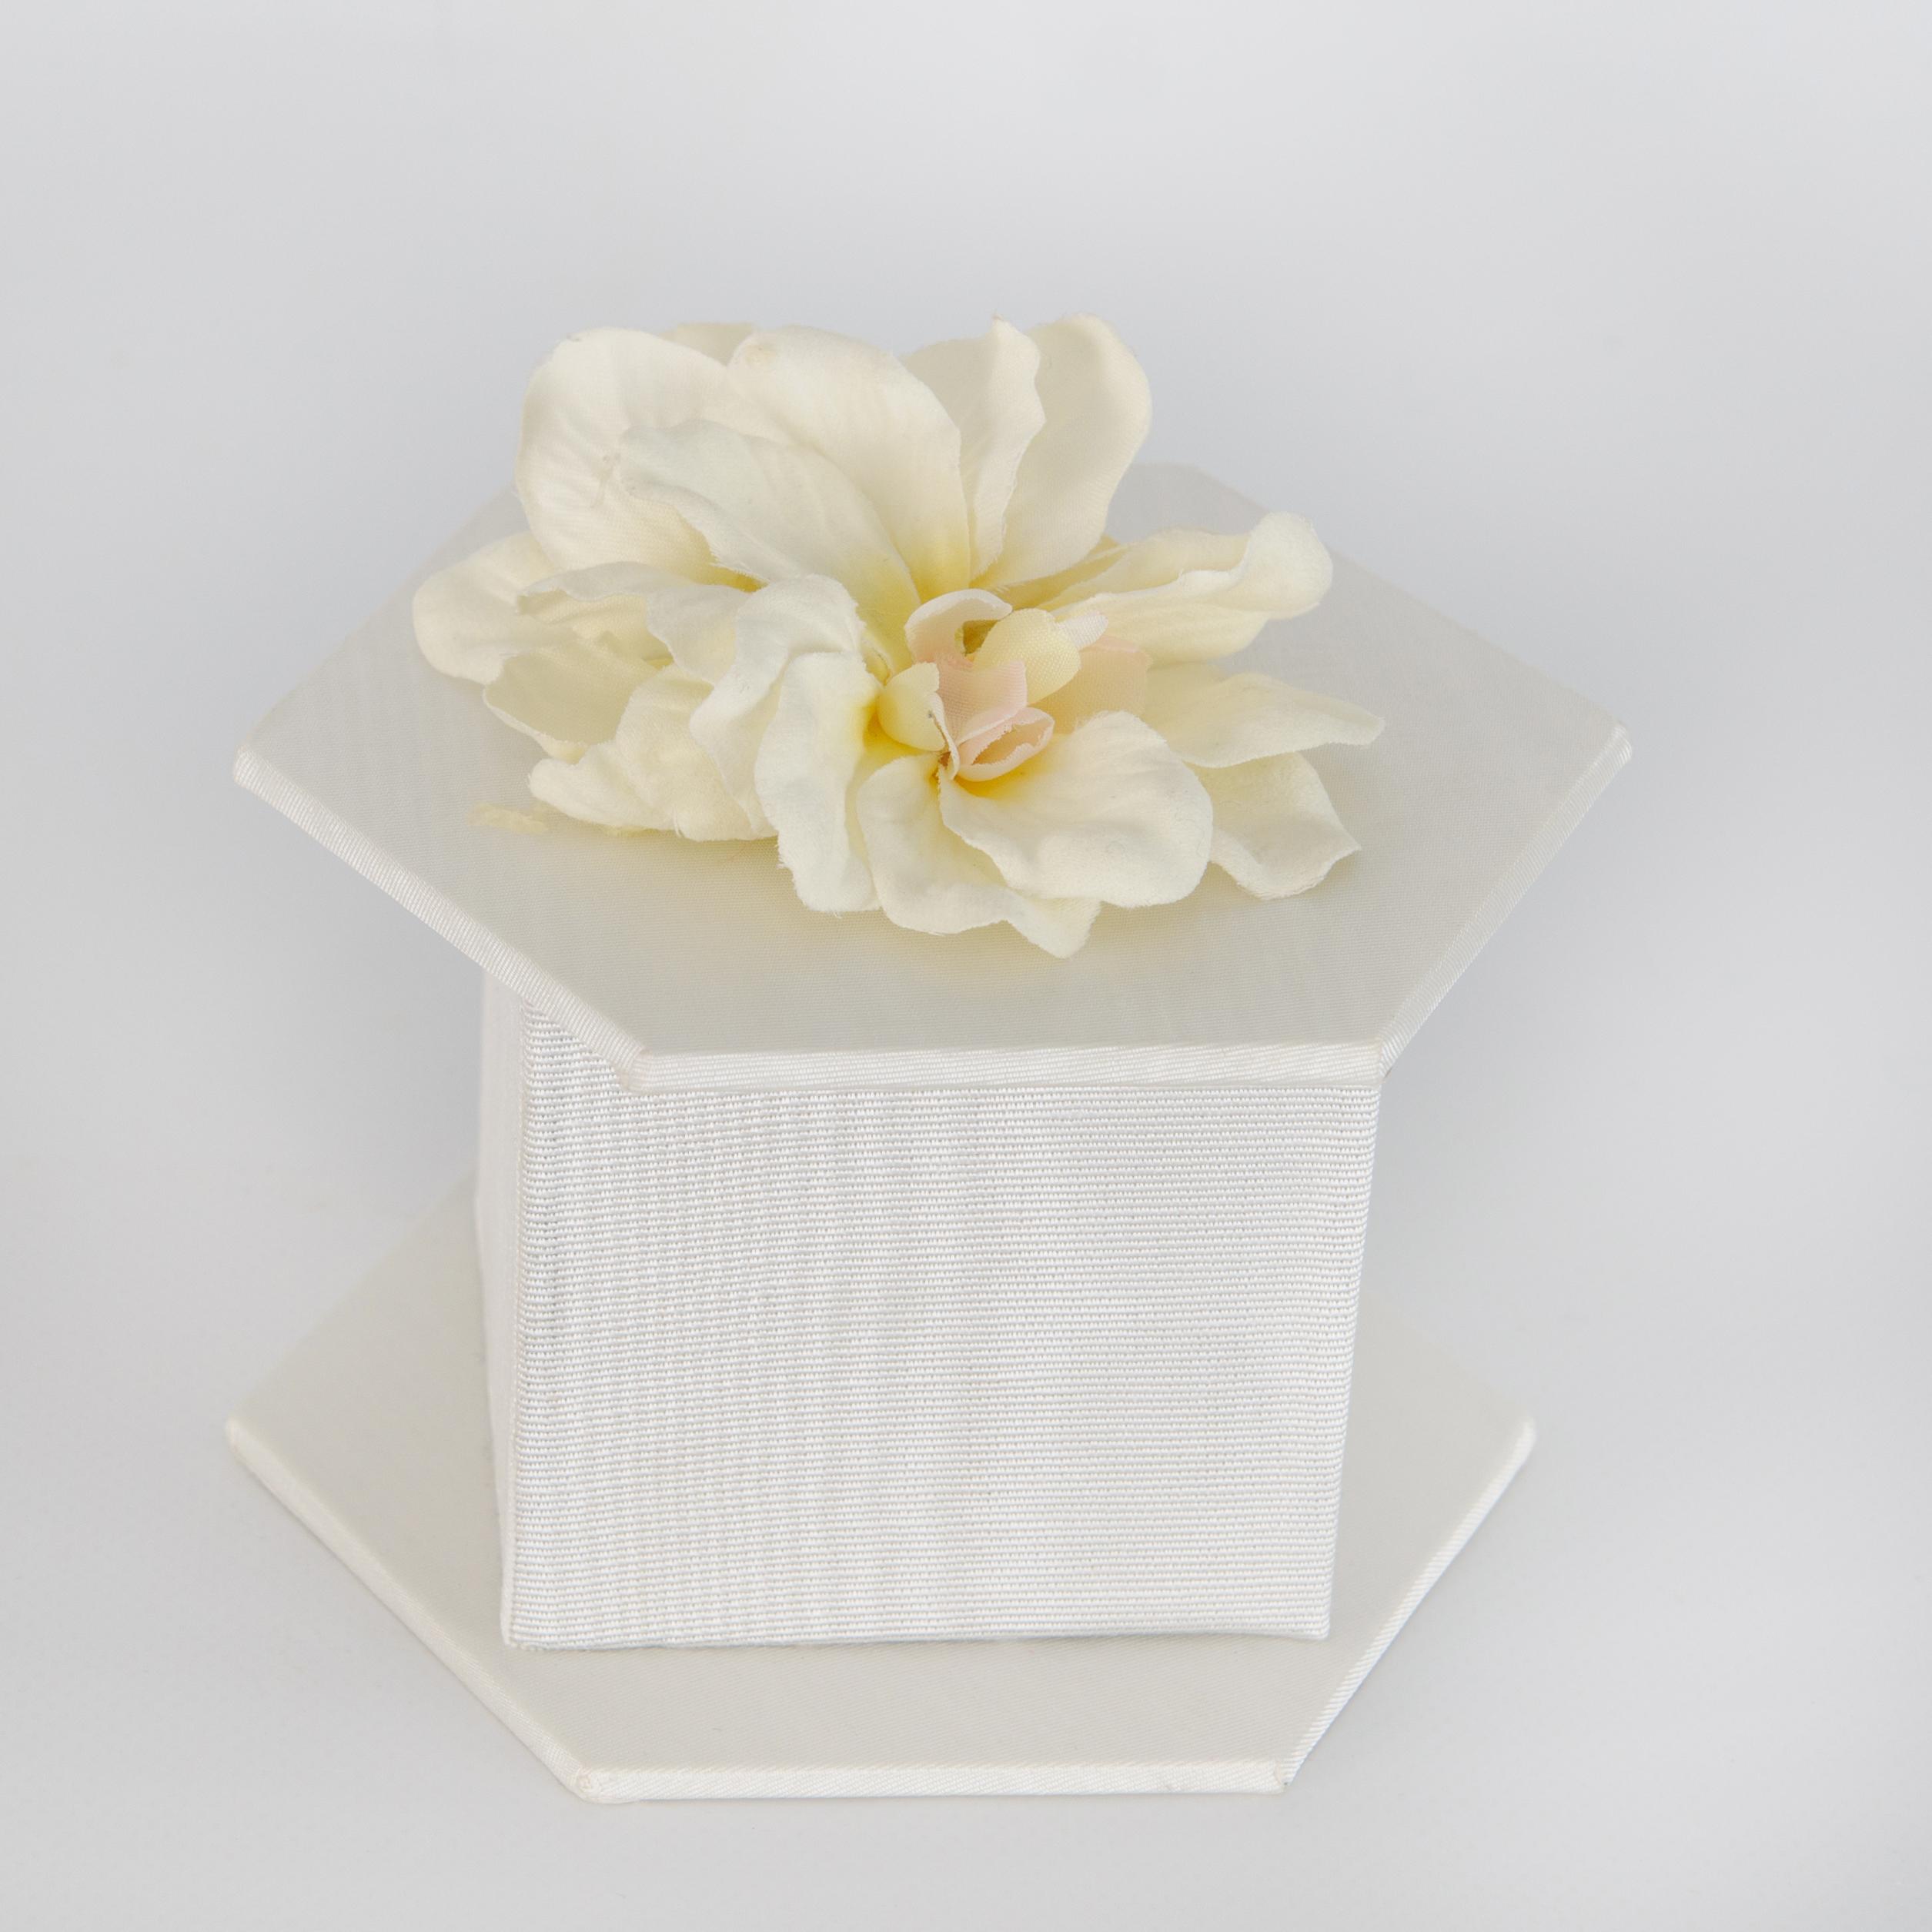 kent house studio wedding favor box